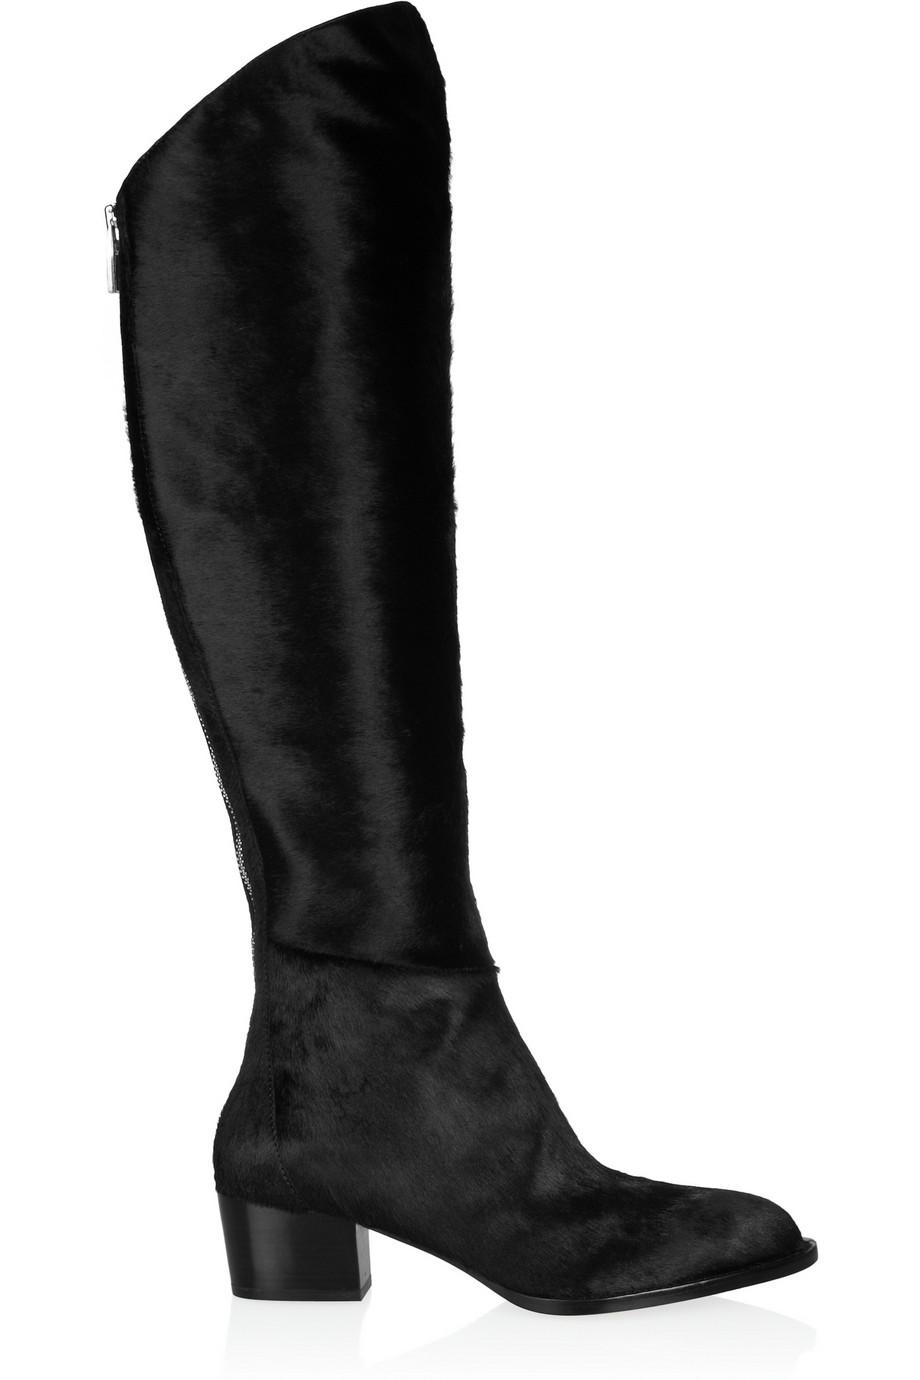 Alexander Wang Singrid Calf Hair Knee Boots $488.25